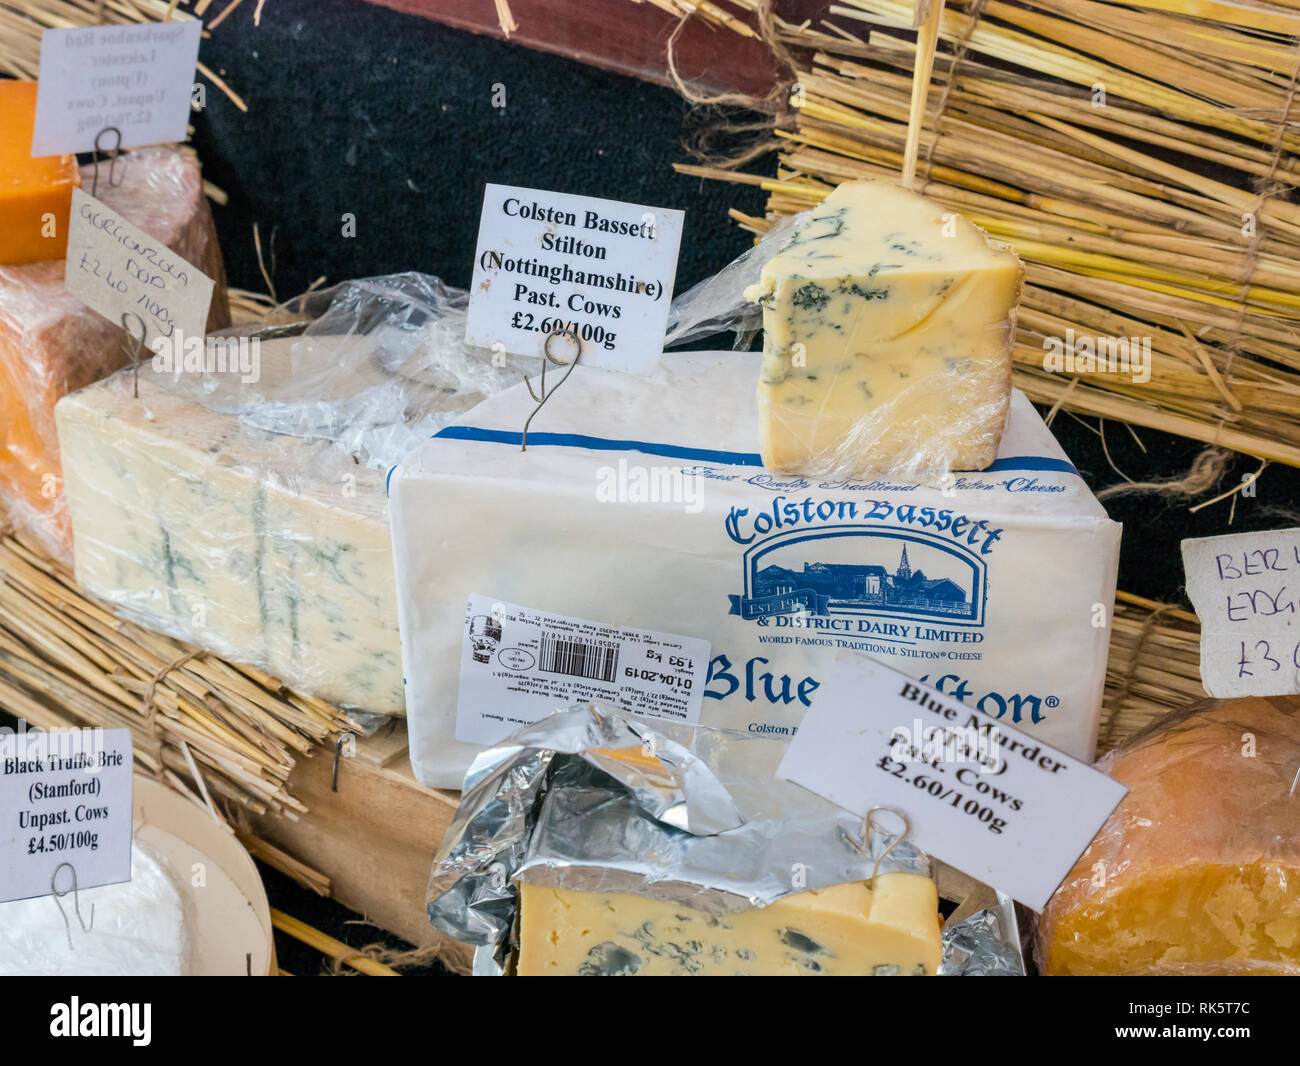 artisan-cheese-stall-cheeses-on-display-